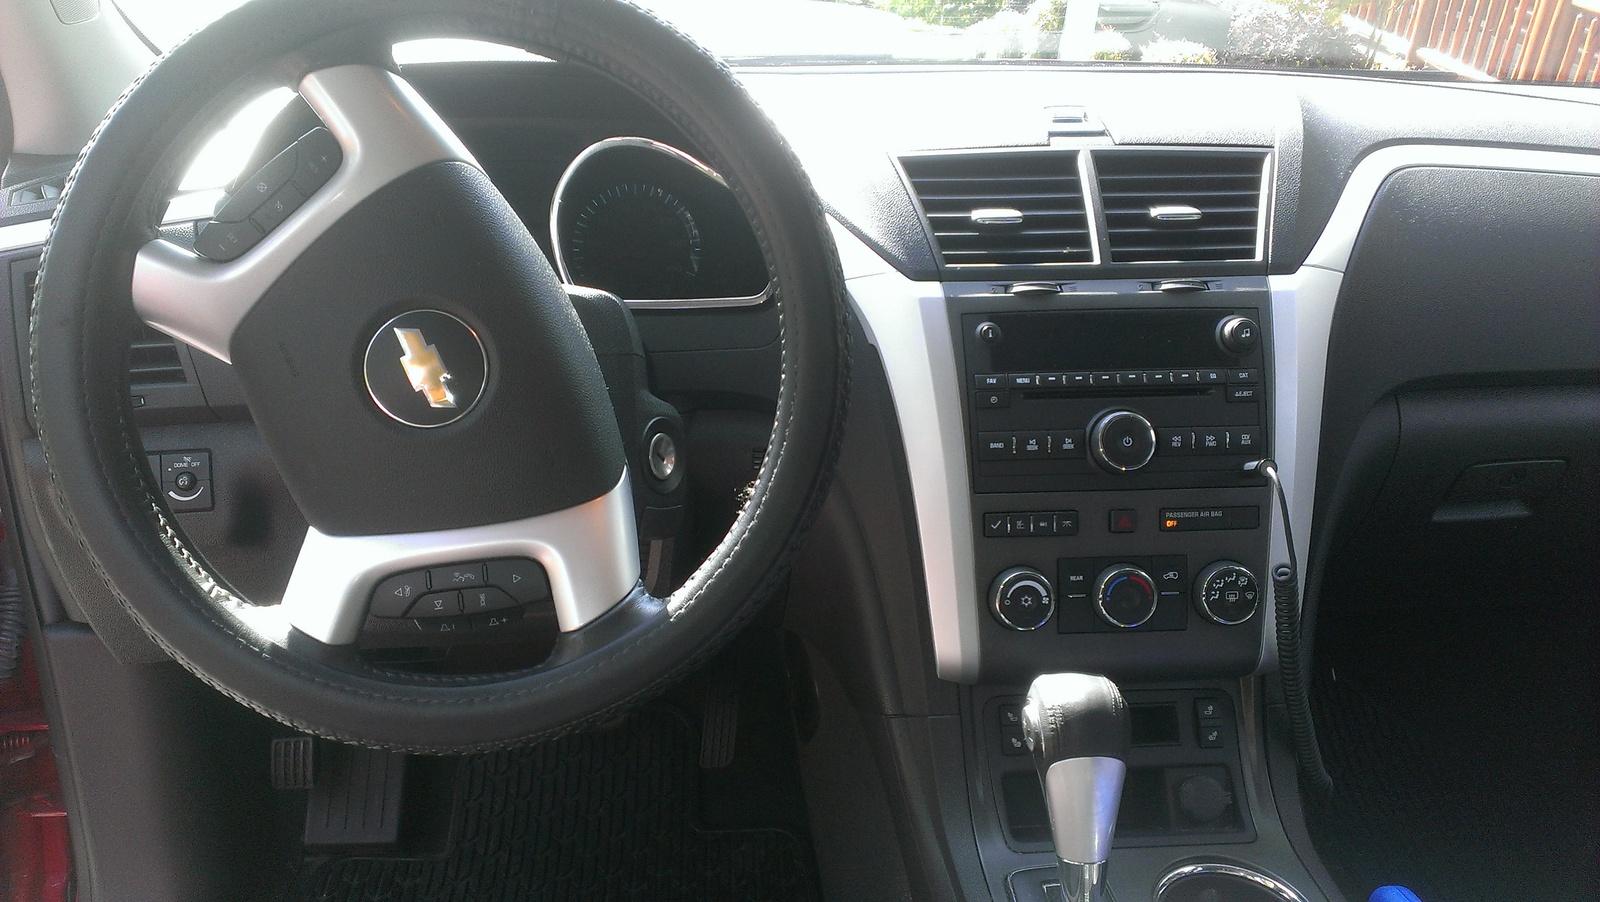 2010 Chevy Traverse Ls 2012 Chevrolet Traverse - Interior Pictures - CarGurus